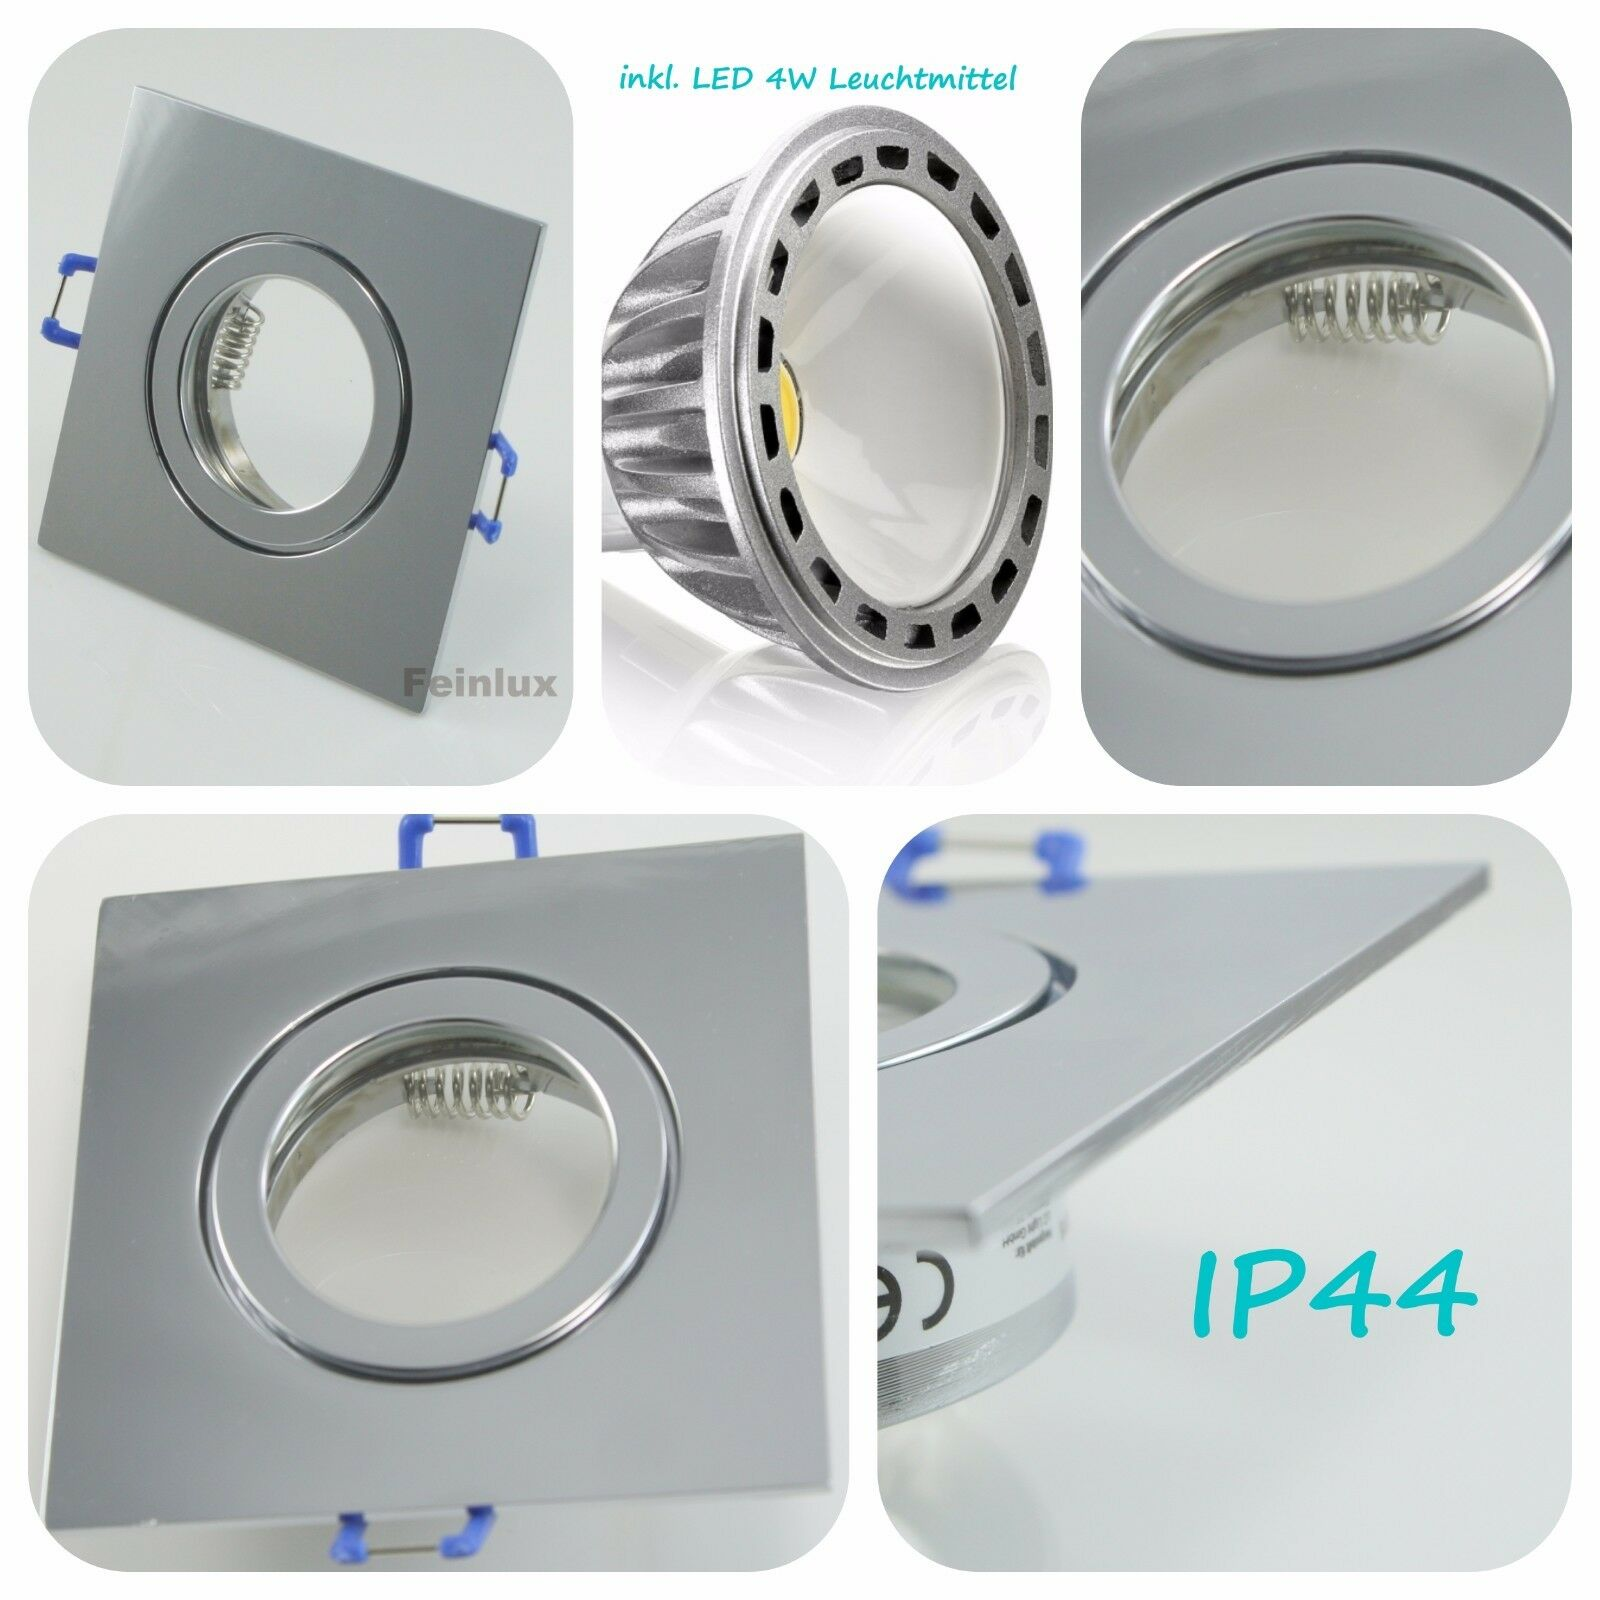 Ip44-feuchtraum nassraum alu installation projecteur 230v/gu10 4w COB LED badleuchten badleuchten badleuchten | La Réputation D'abord  9895ee